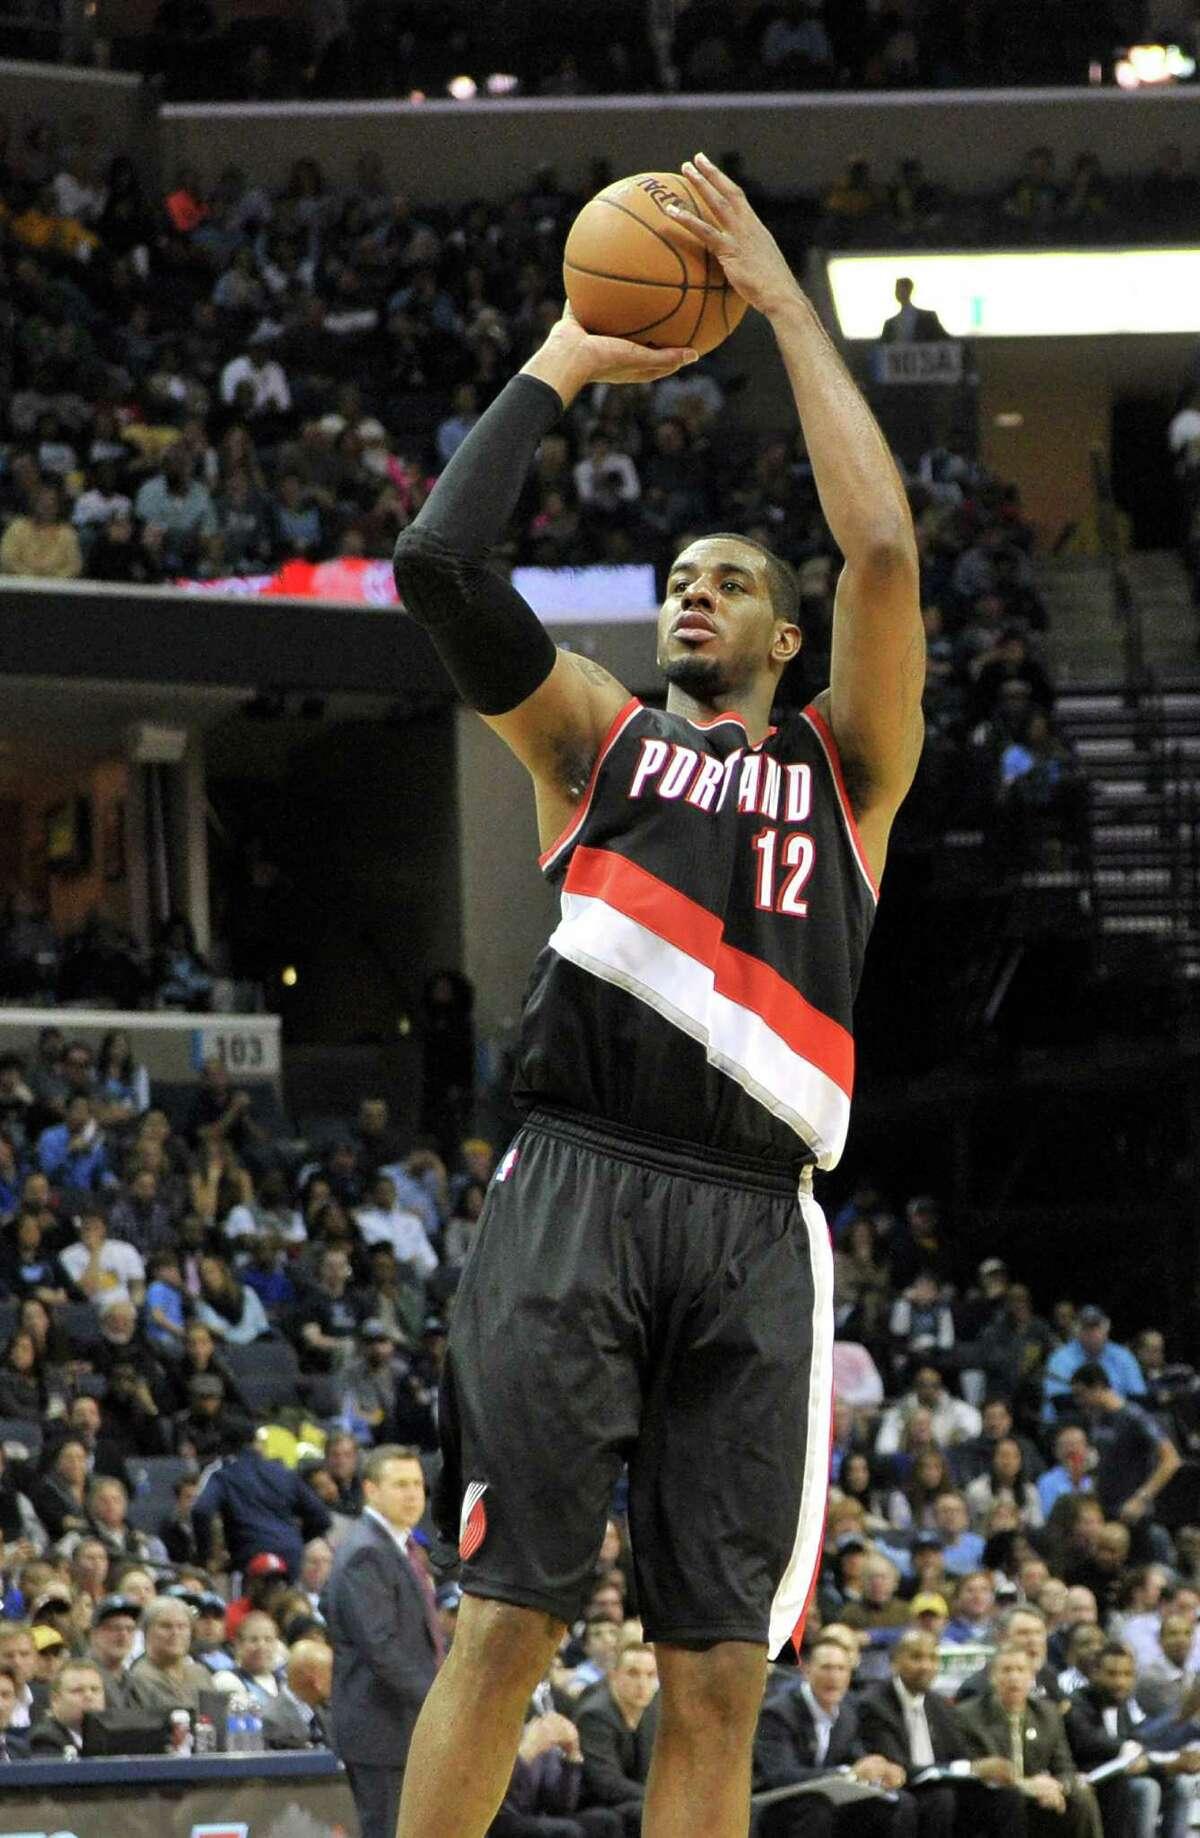 Portland Trail Blazers forward LaMarcus Aldridge (12) plays in the first half of an NBA basketball game Saturday, Jan. 17, 2015, in Memphis, Tenn.